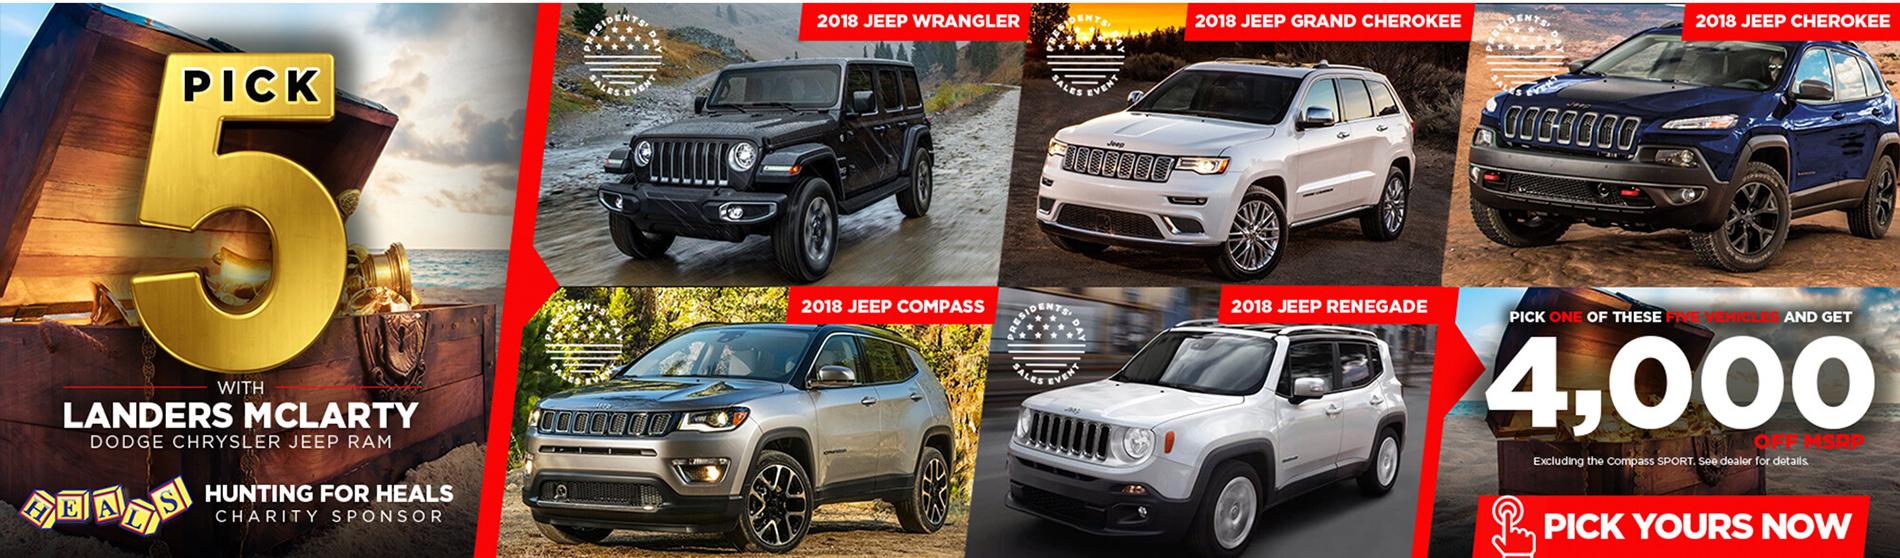 Jeep Pick Five Event